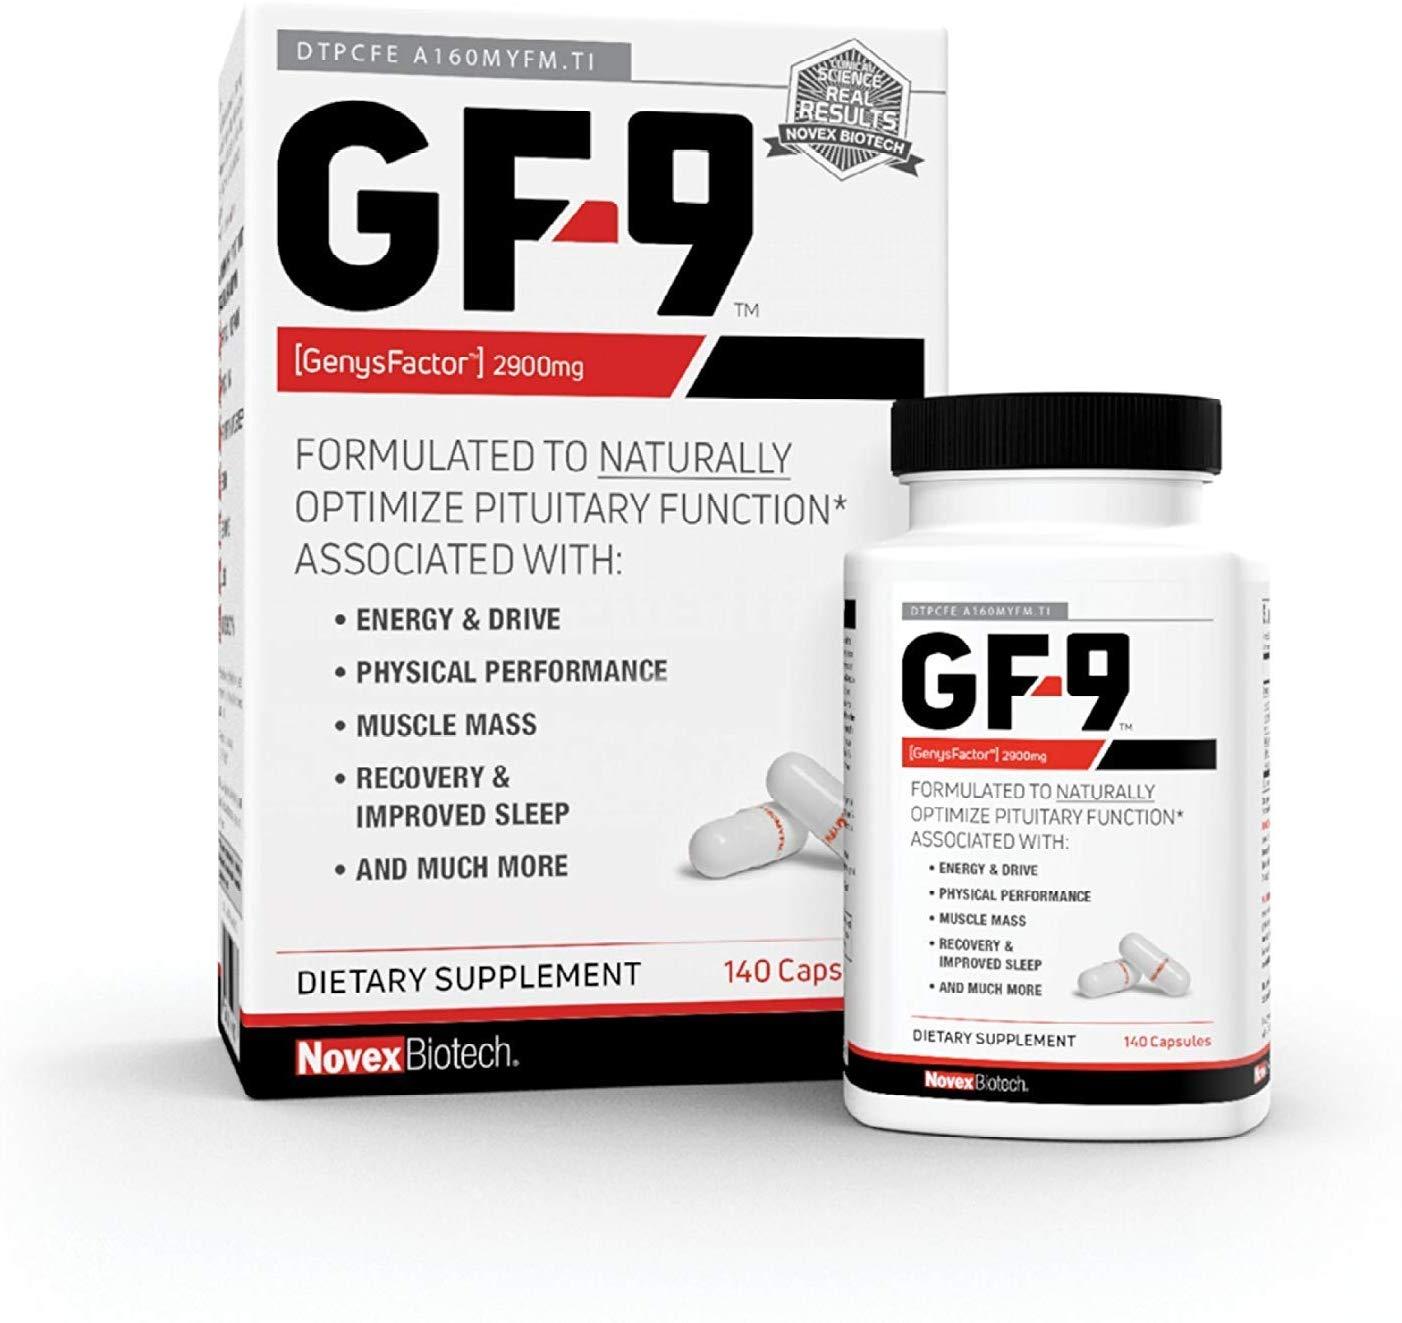 GF 9 reviews